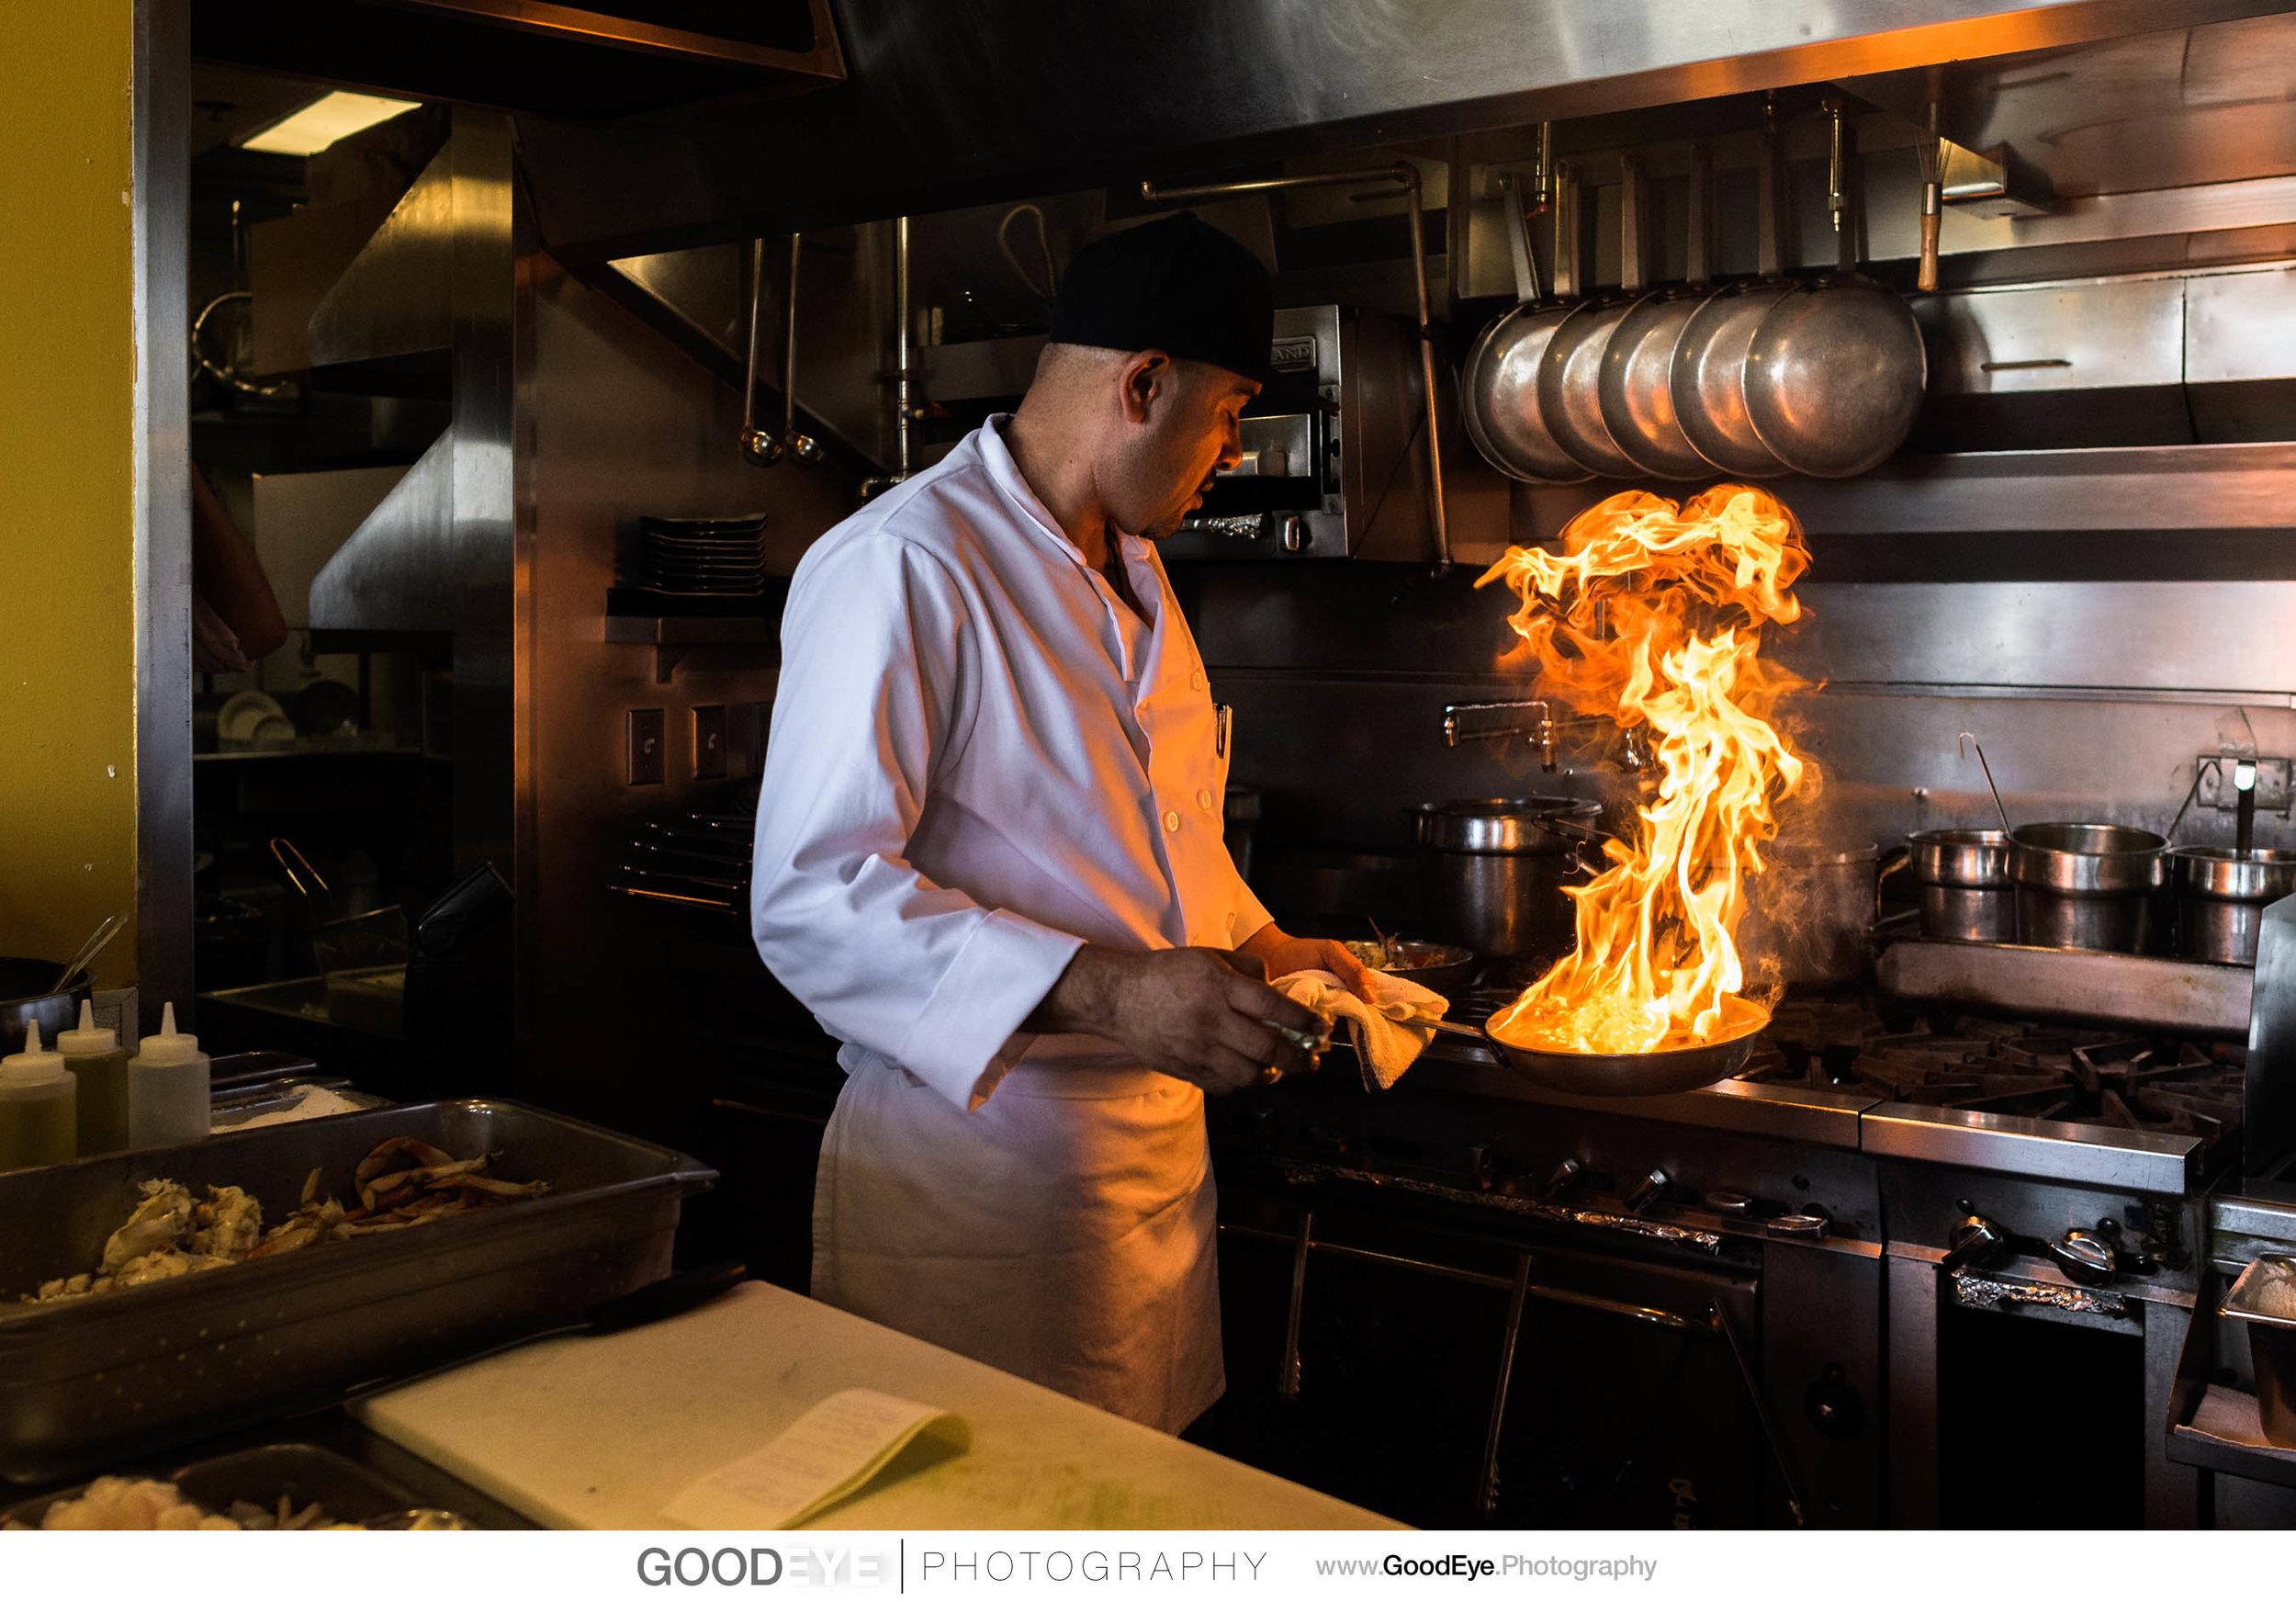 4868_Cafe_8_Aliotos_San_Francisco_Food_Photography_web.jpg